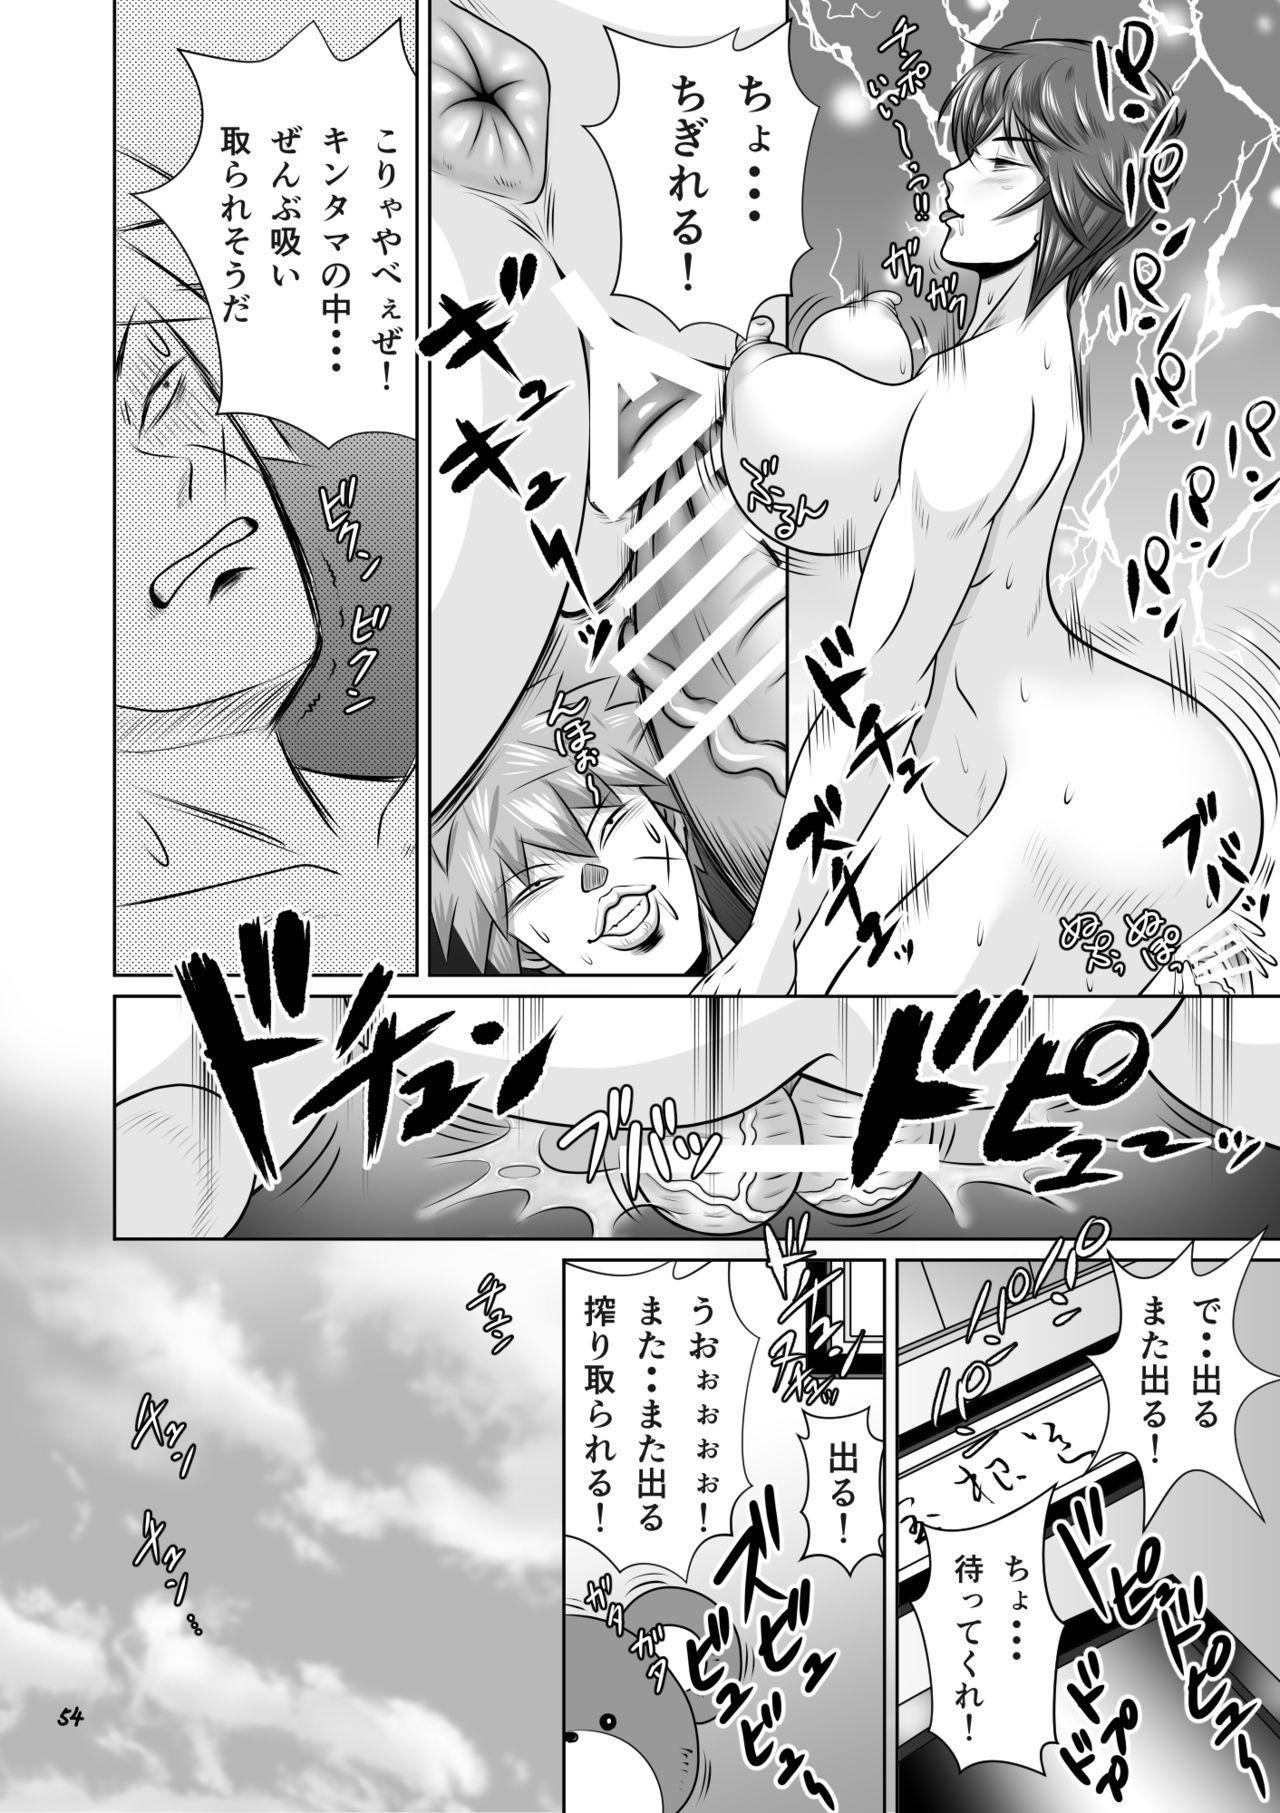 Netorare Osananajimi Haruka-chan Kiki Ippatsu!! 54